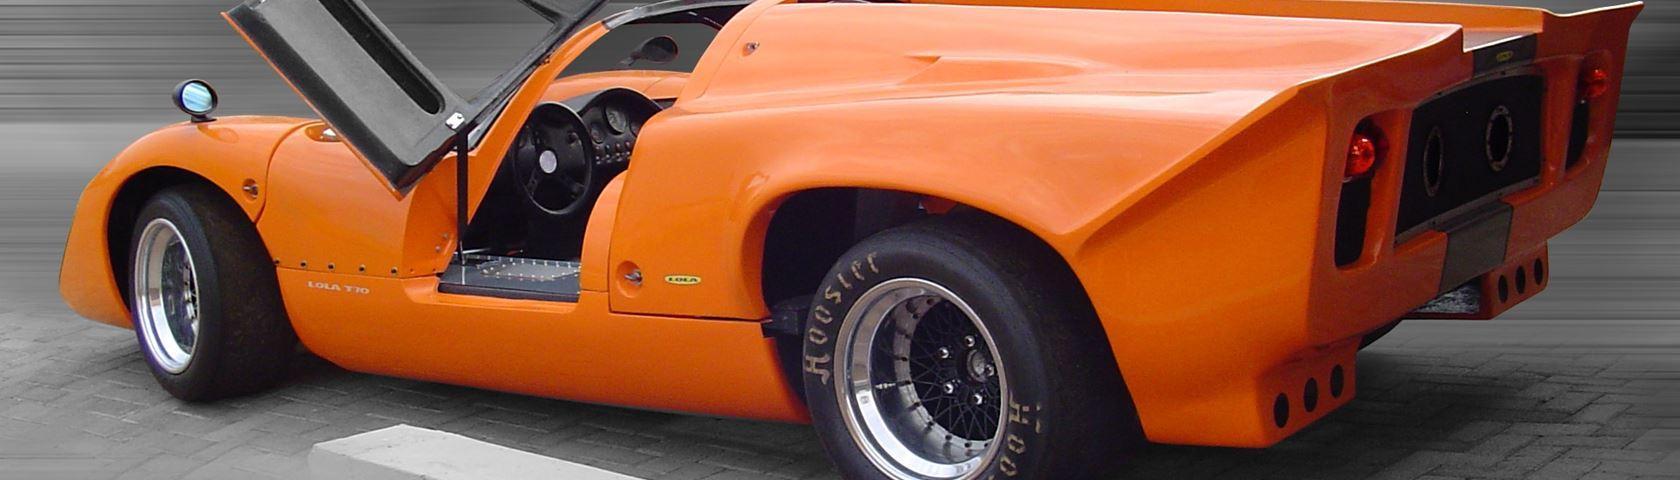 Lola T70 3B Replica